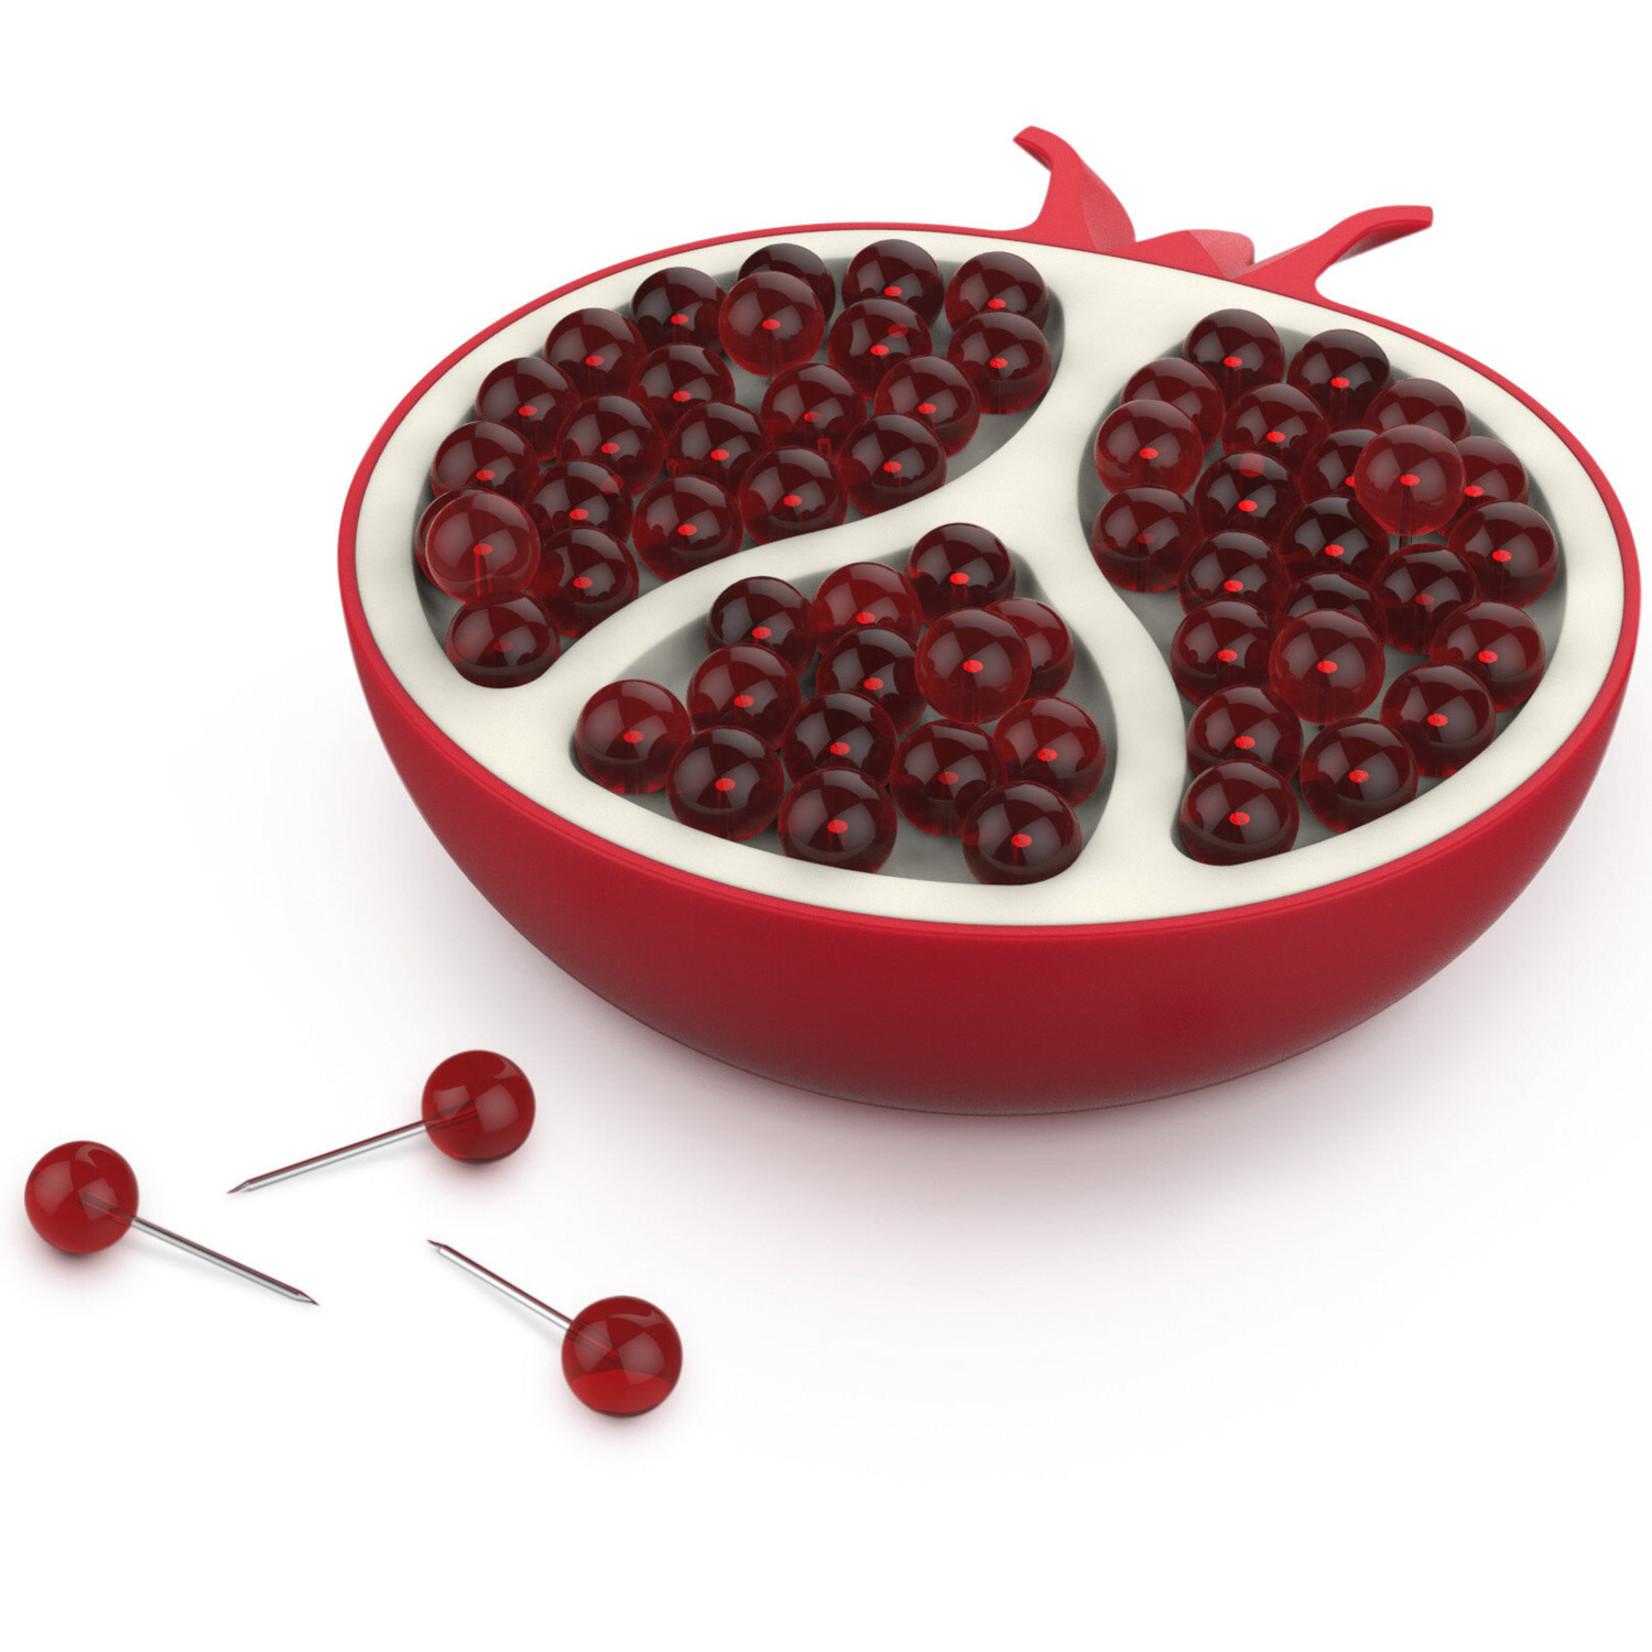 Pomegranate Pushpins